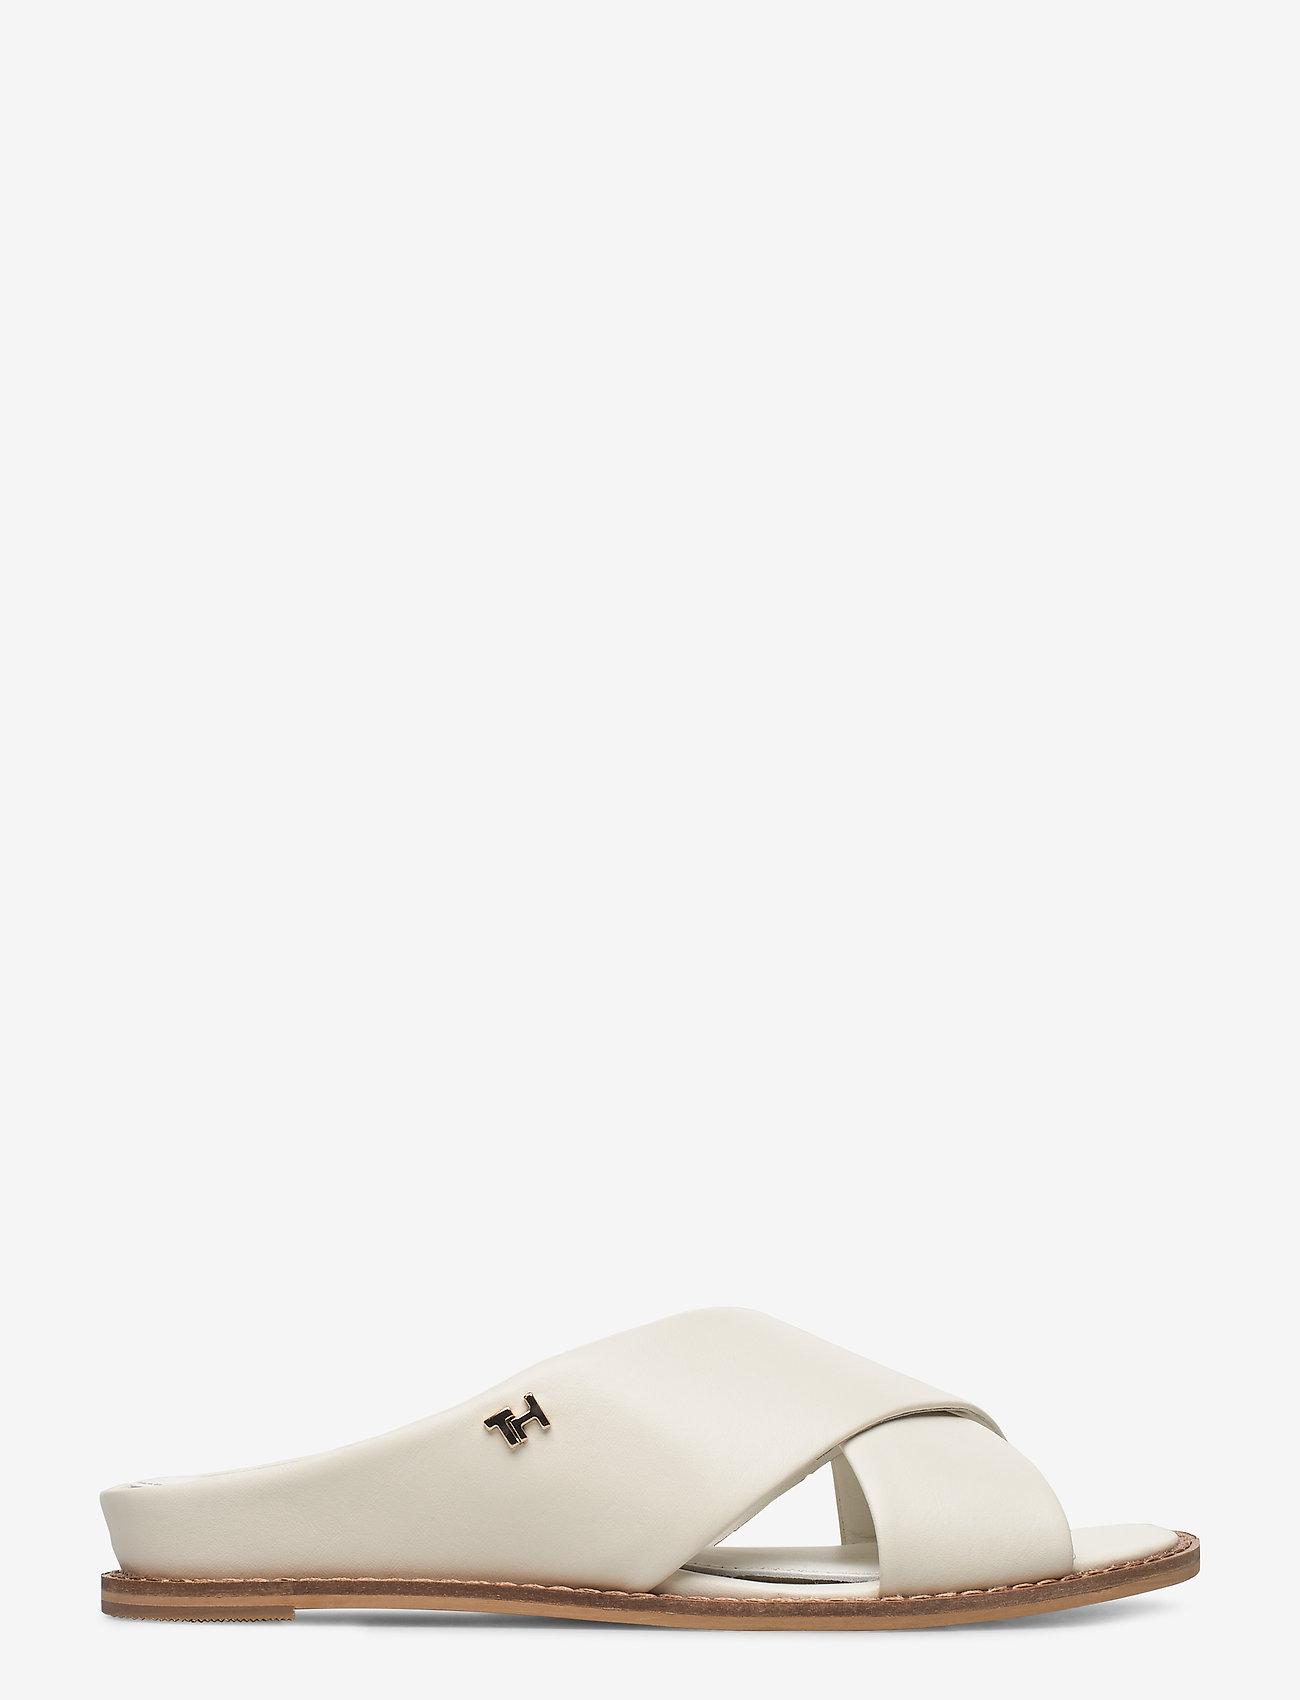 Tommy Hilfiger - FEMININE LEATHER LOW WEDGE - flade sandaler - white - 1